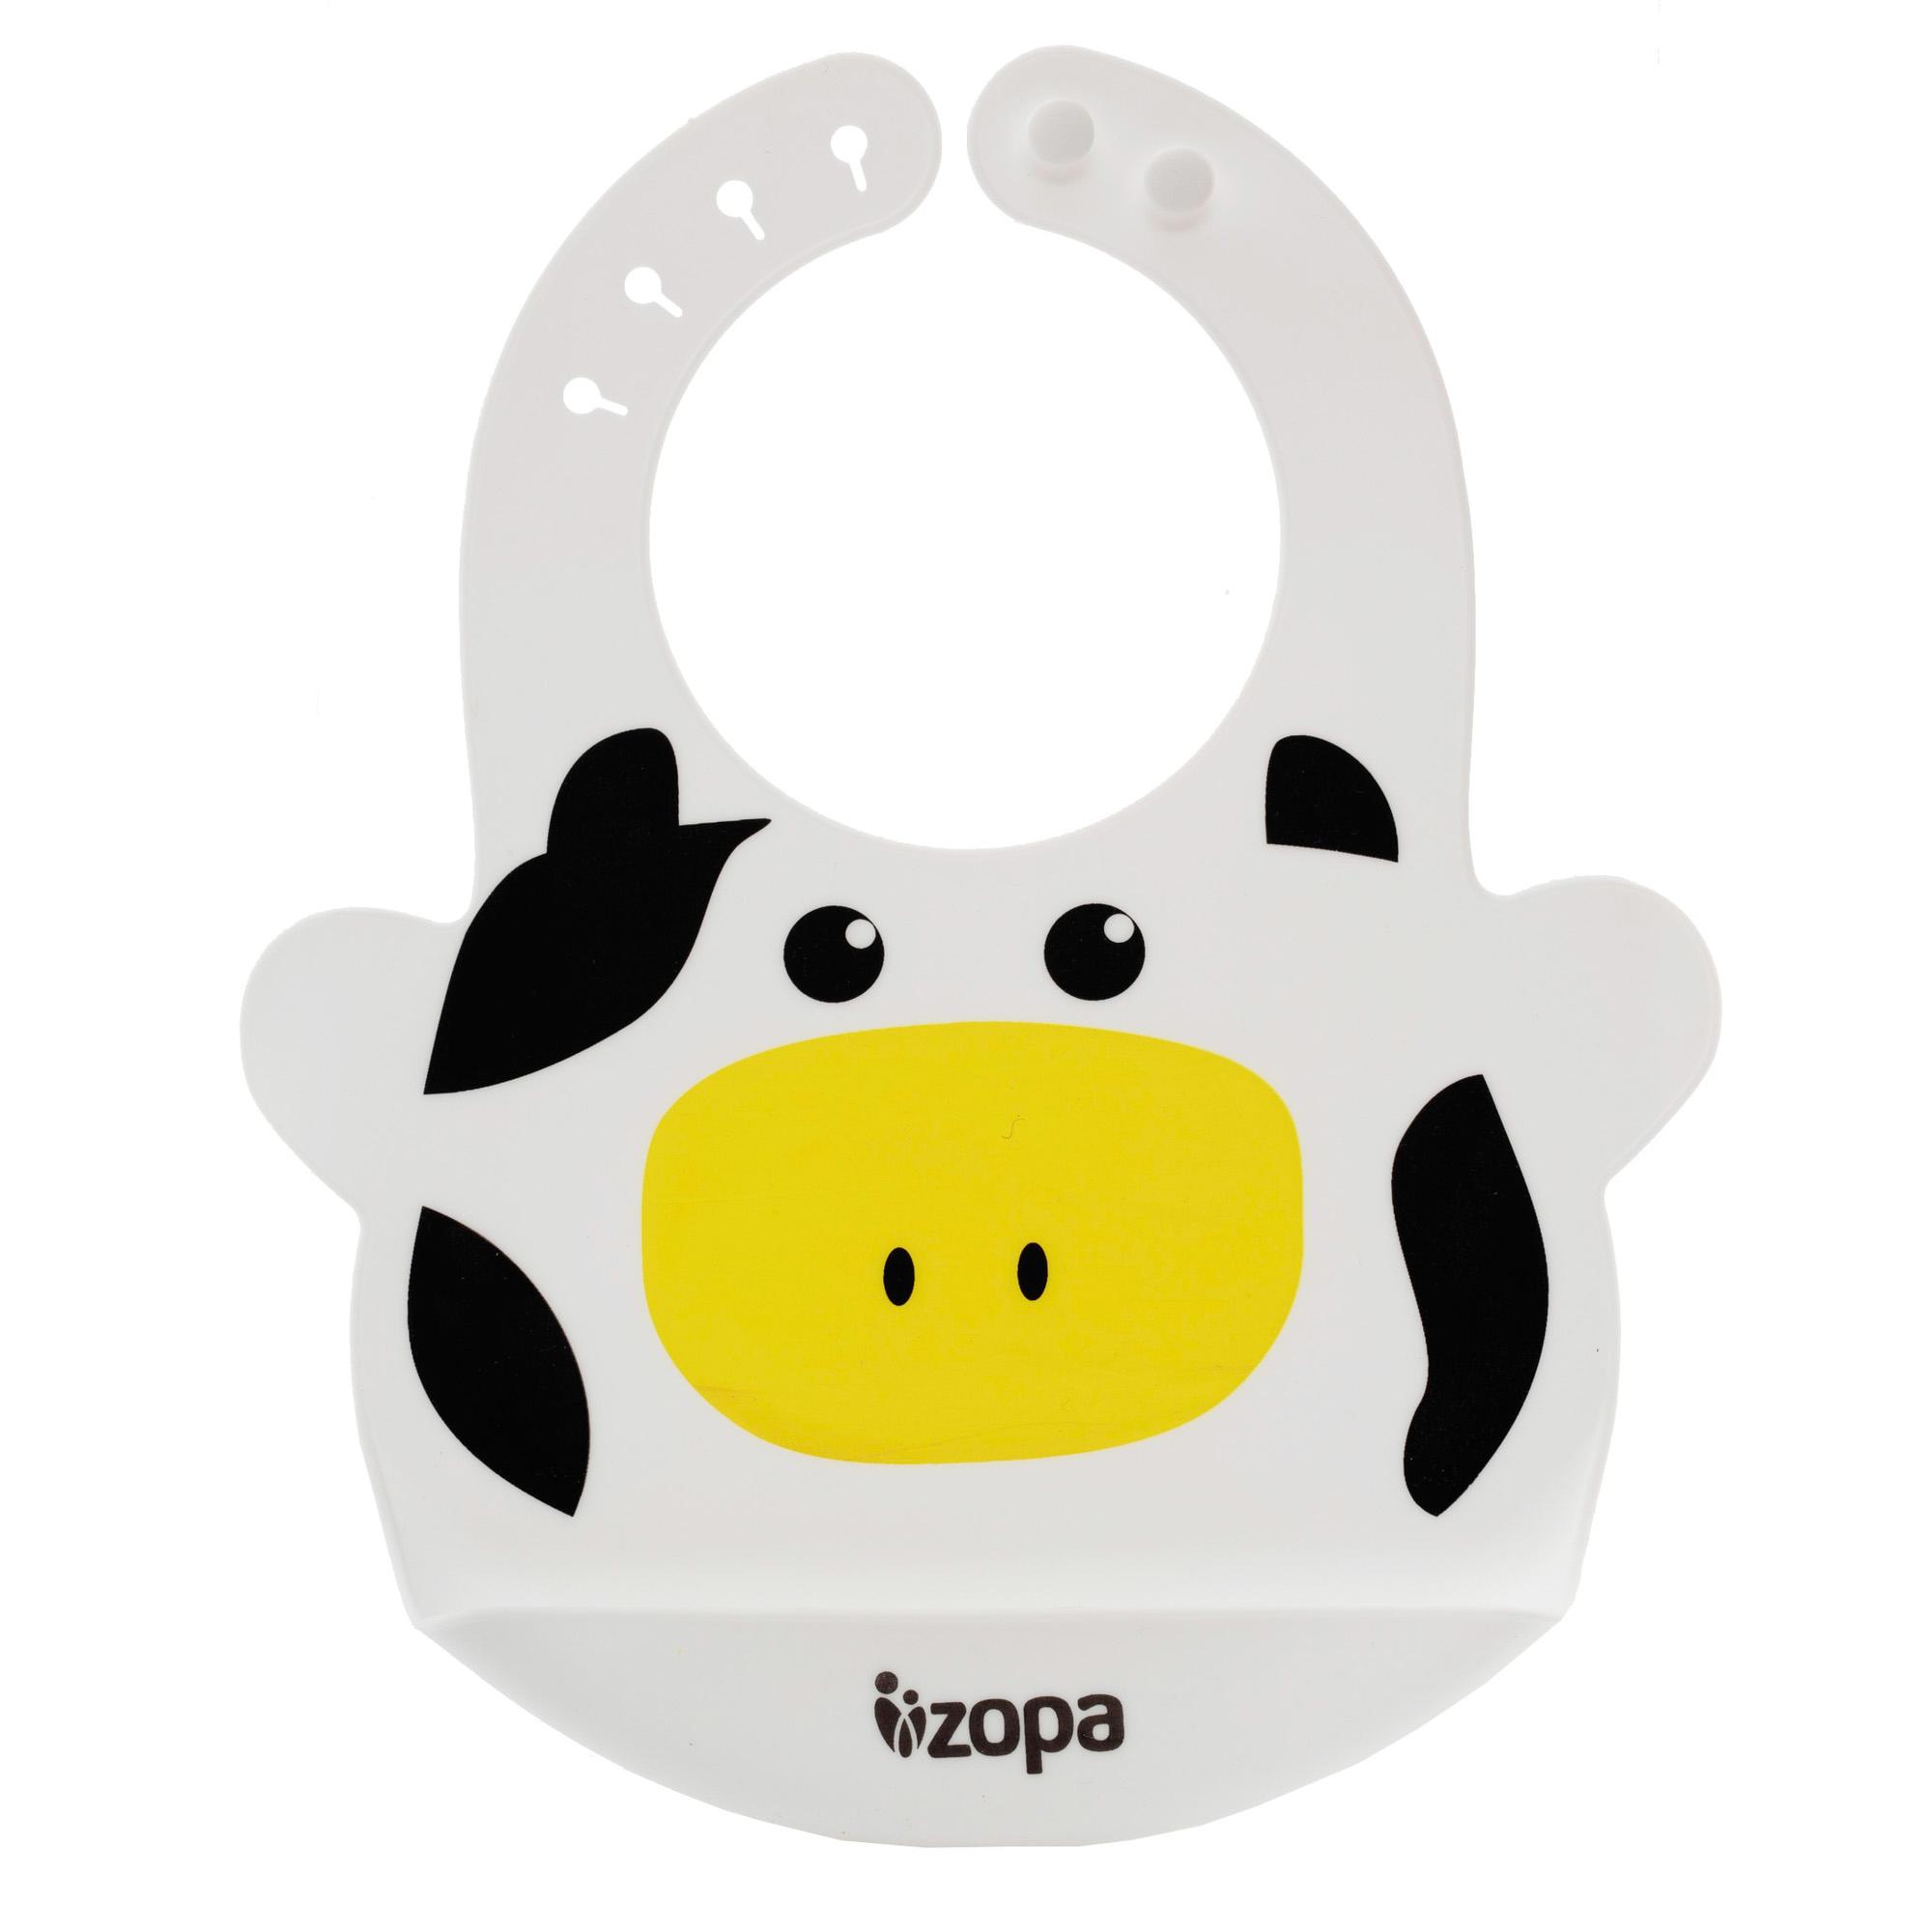 Silikonový bryndák, Cow